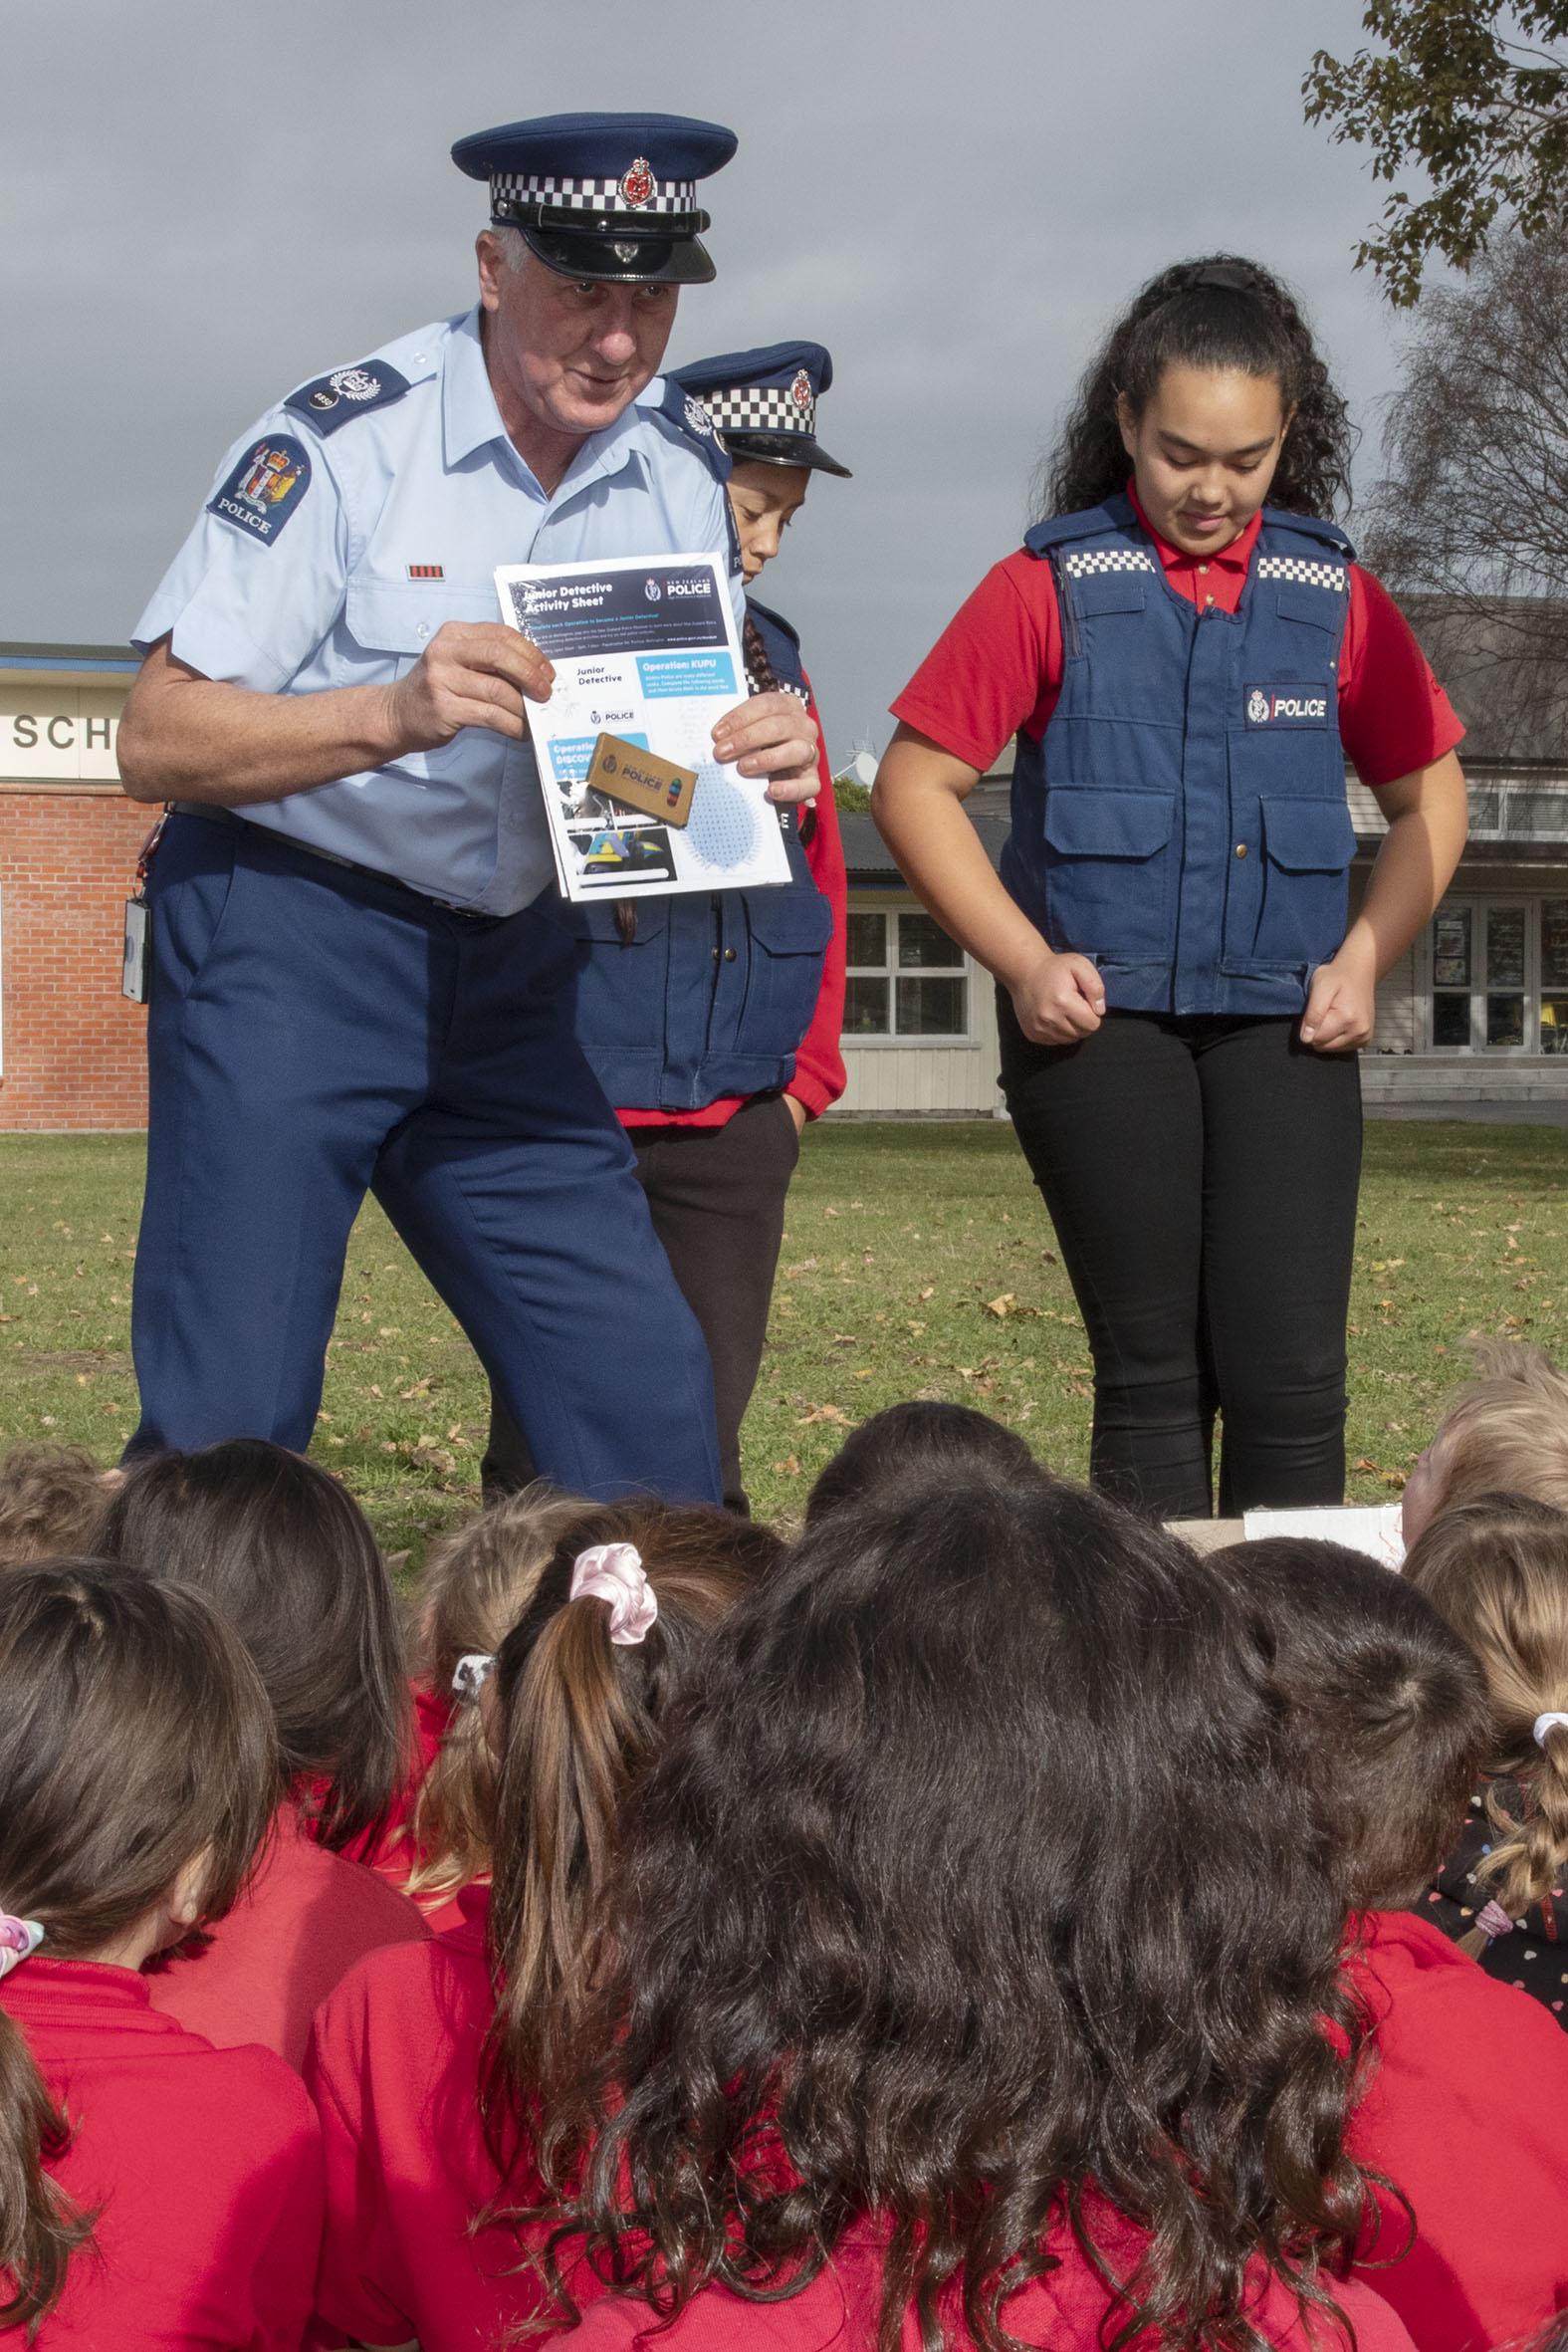 Senior Sergeant Roy Appley hands out Junior Detective activity packs. Photo: Geoff Sloan